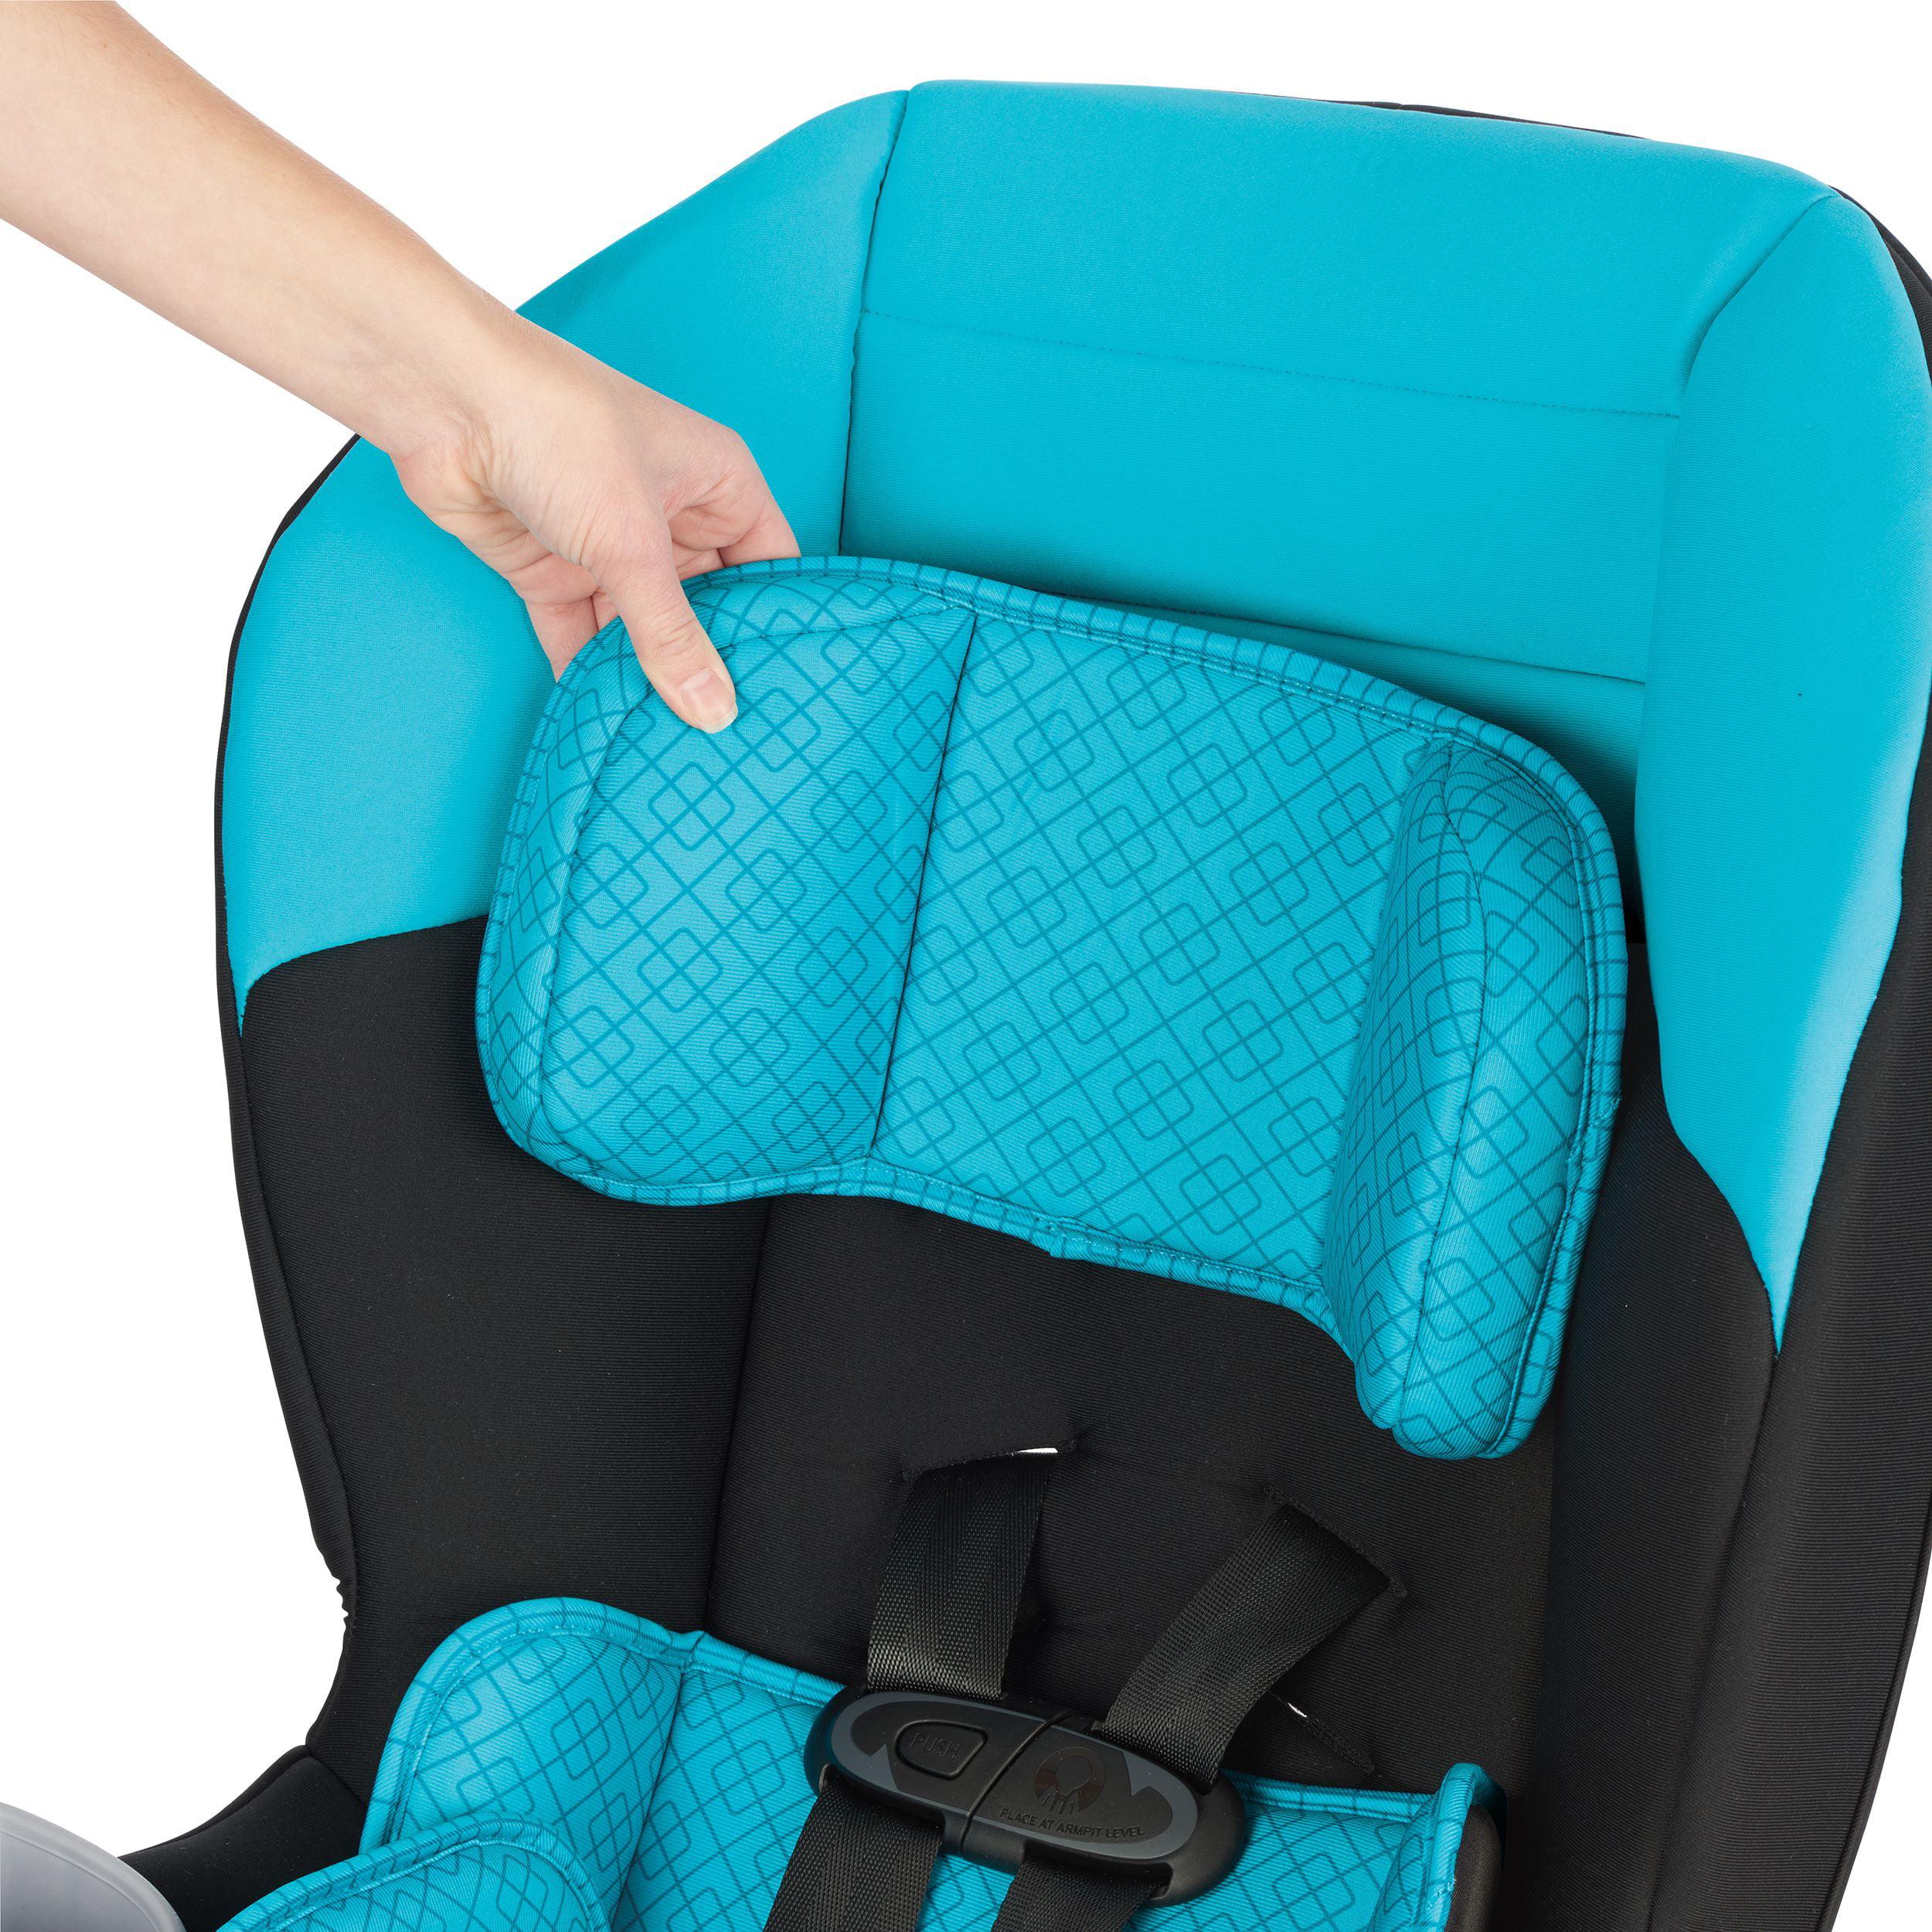 Urbini Presti Convertible Car Seat, Teal - Walmart.com